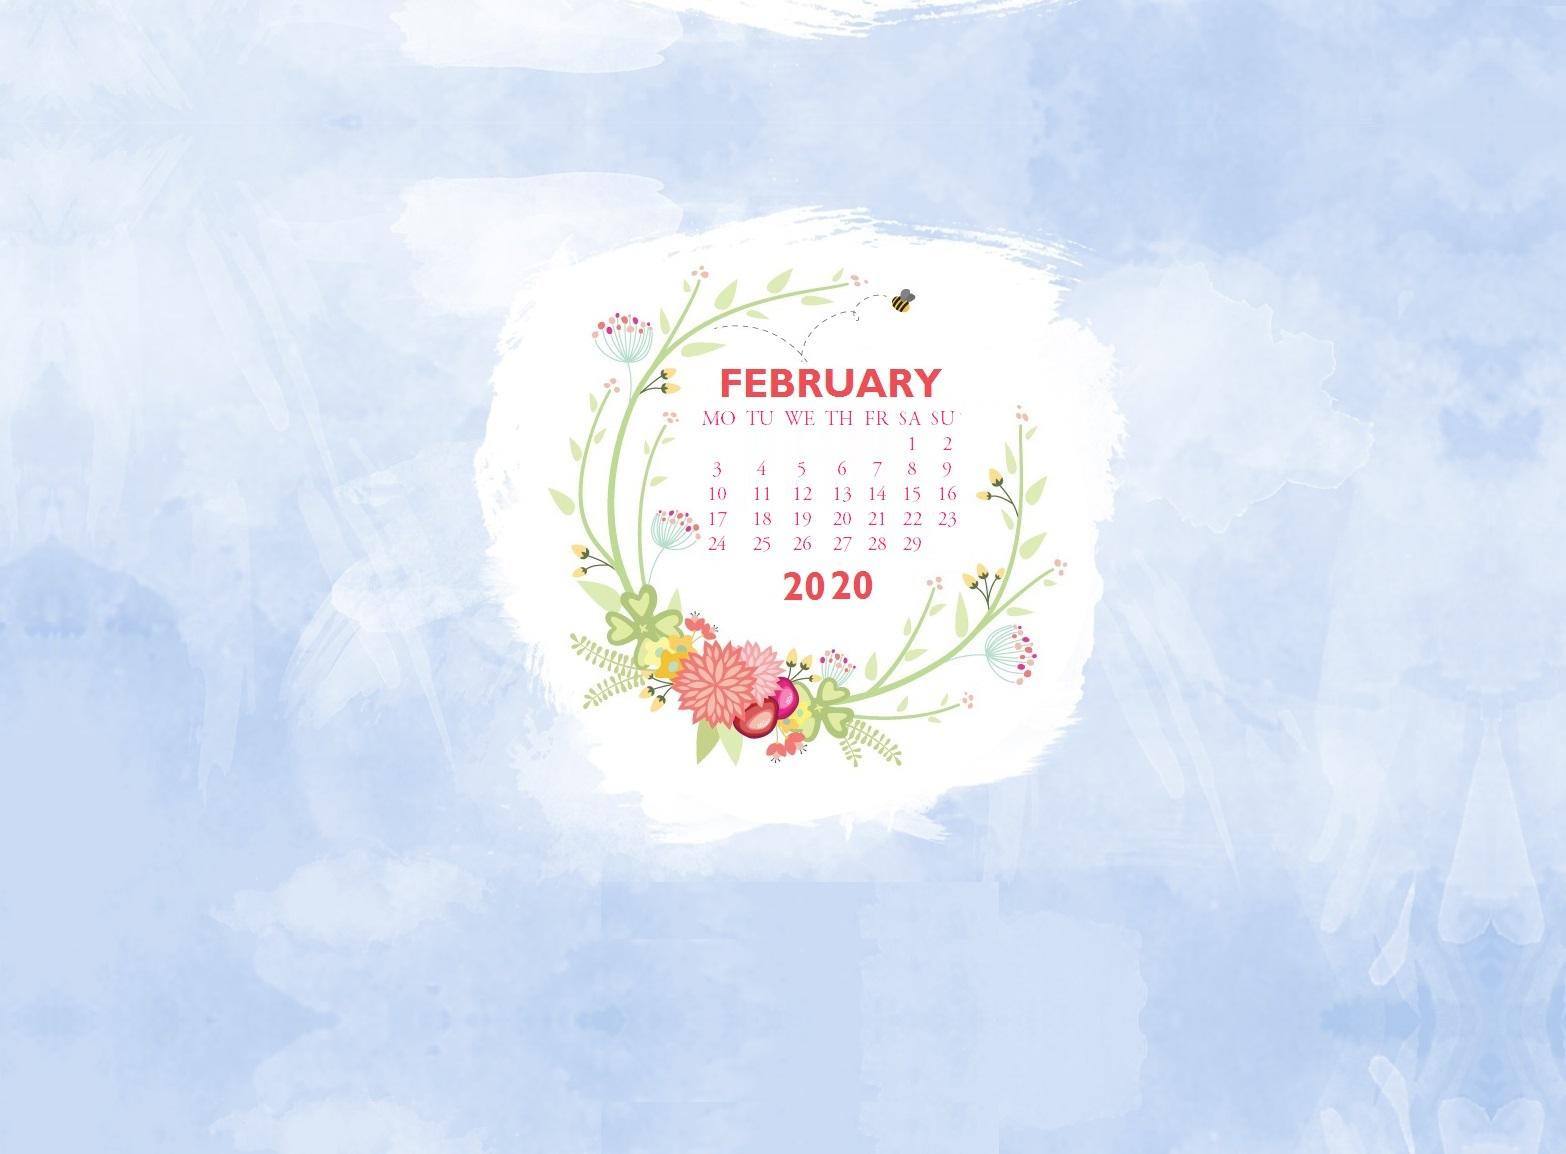 Floral February 2020 Desktop Wallpaper